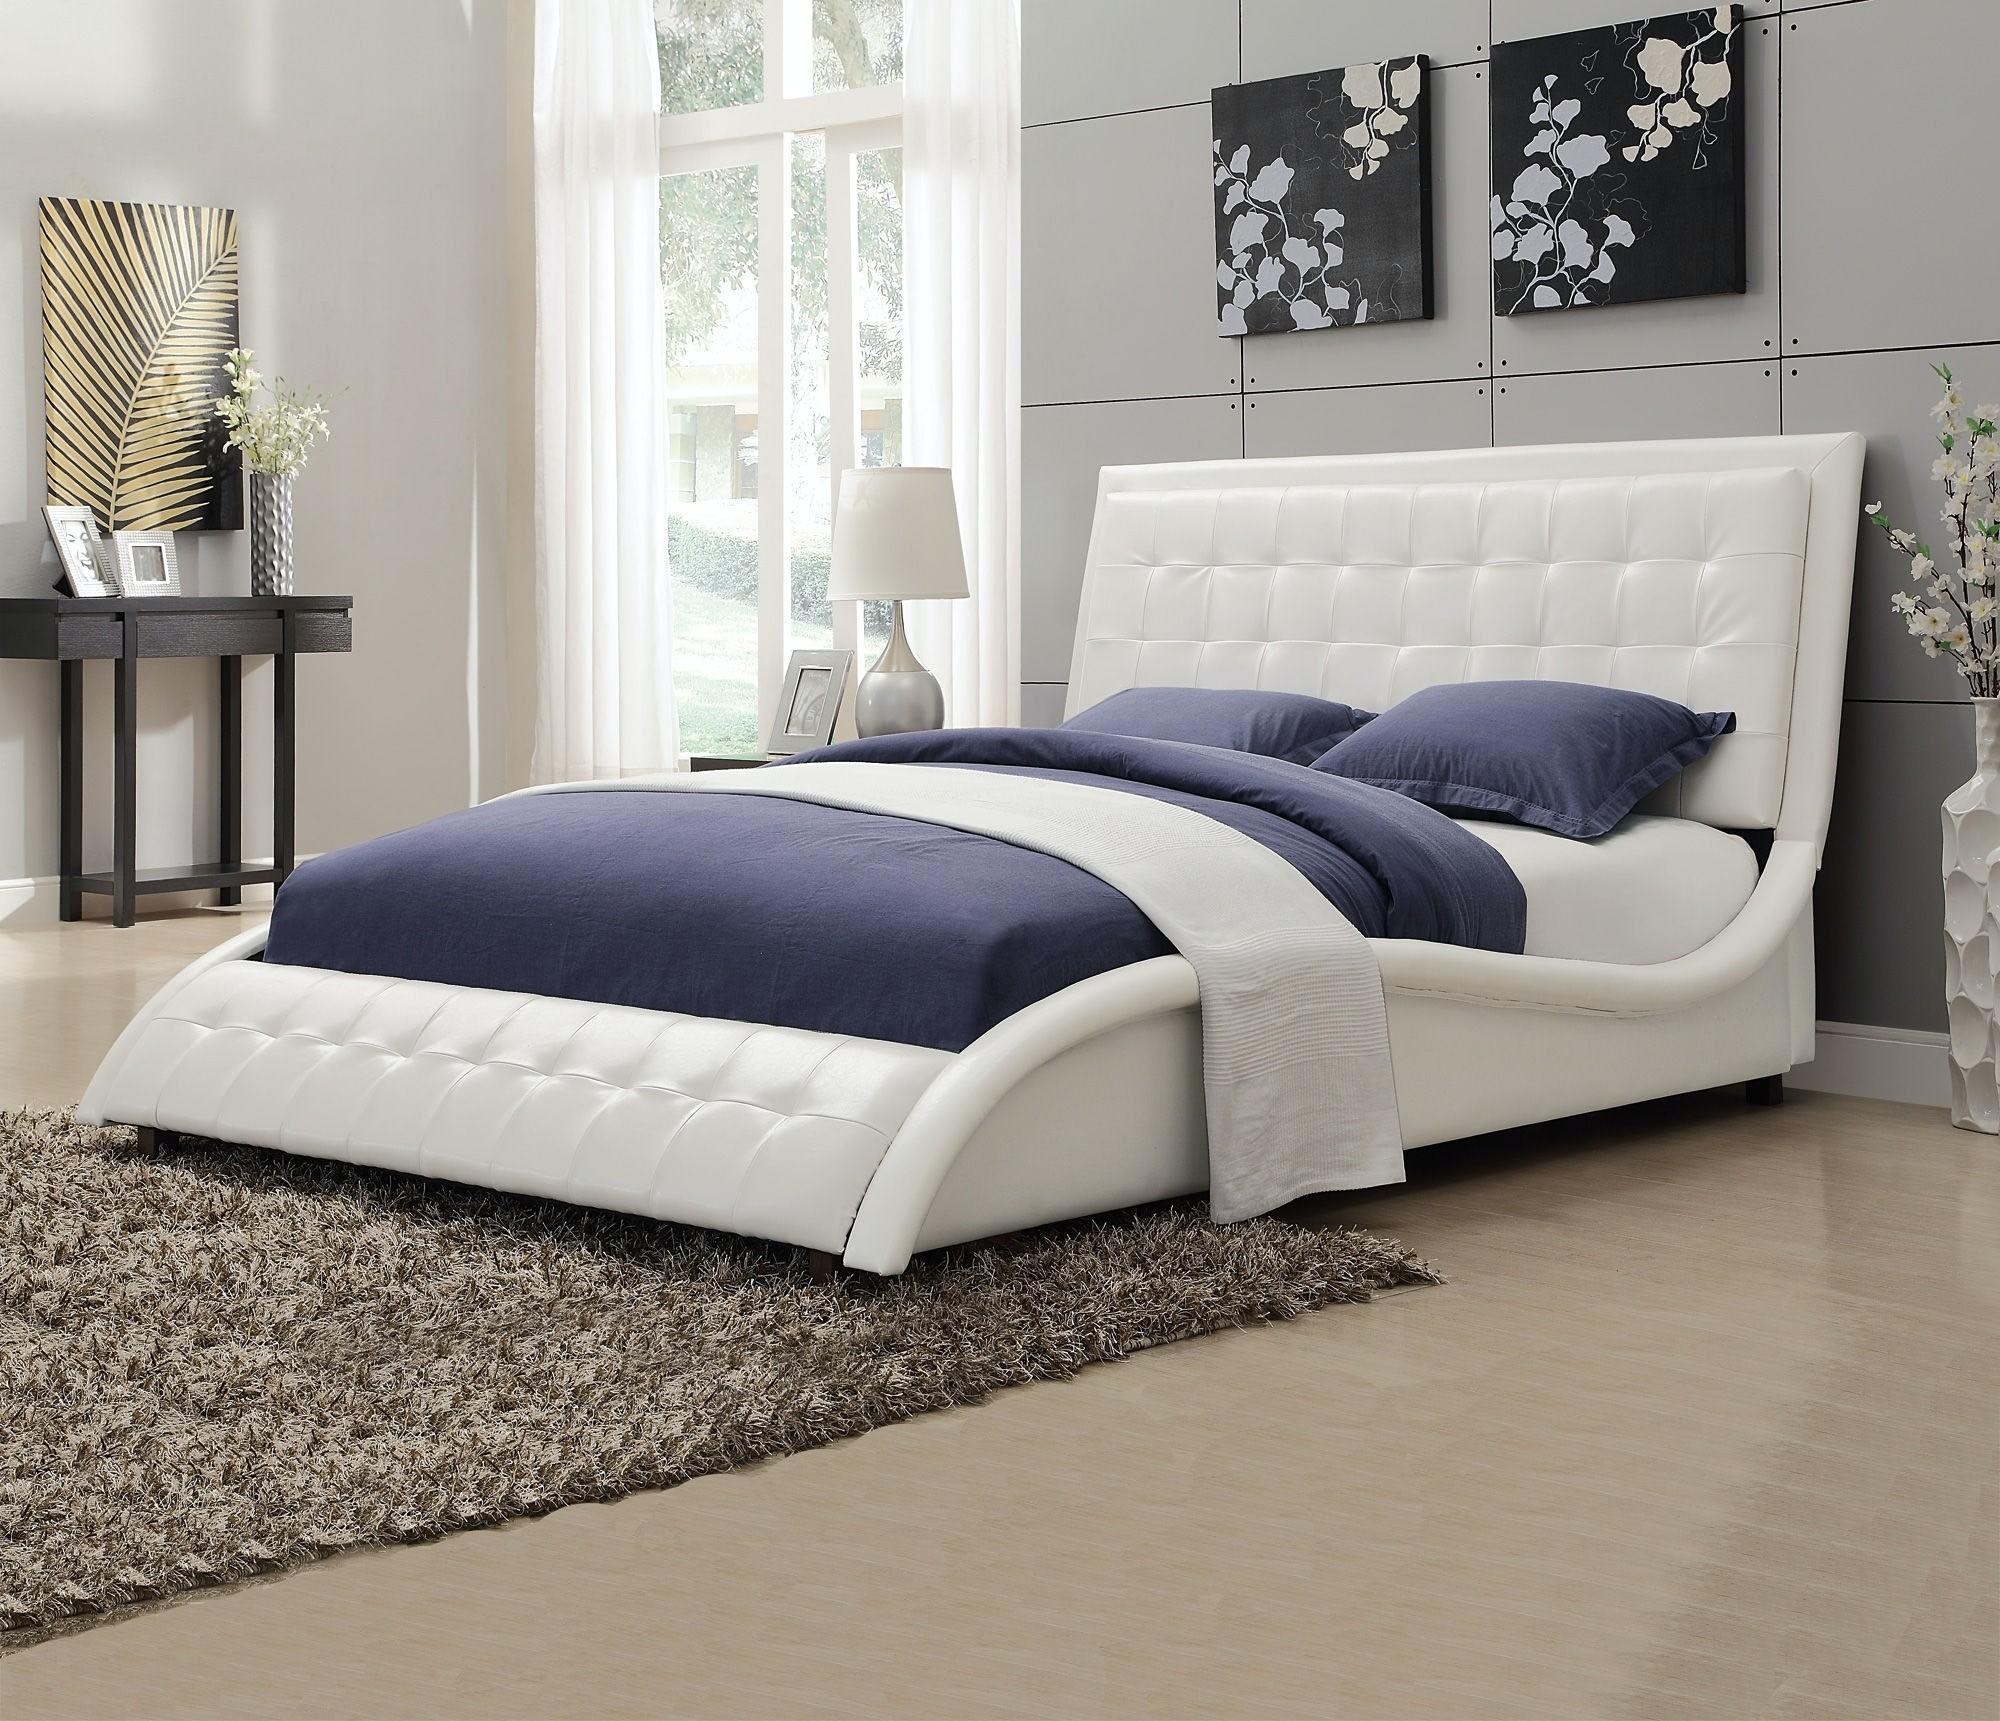 Custom Queen Bed Frames Decoration